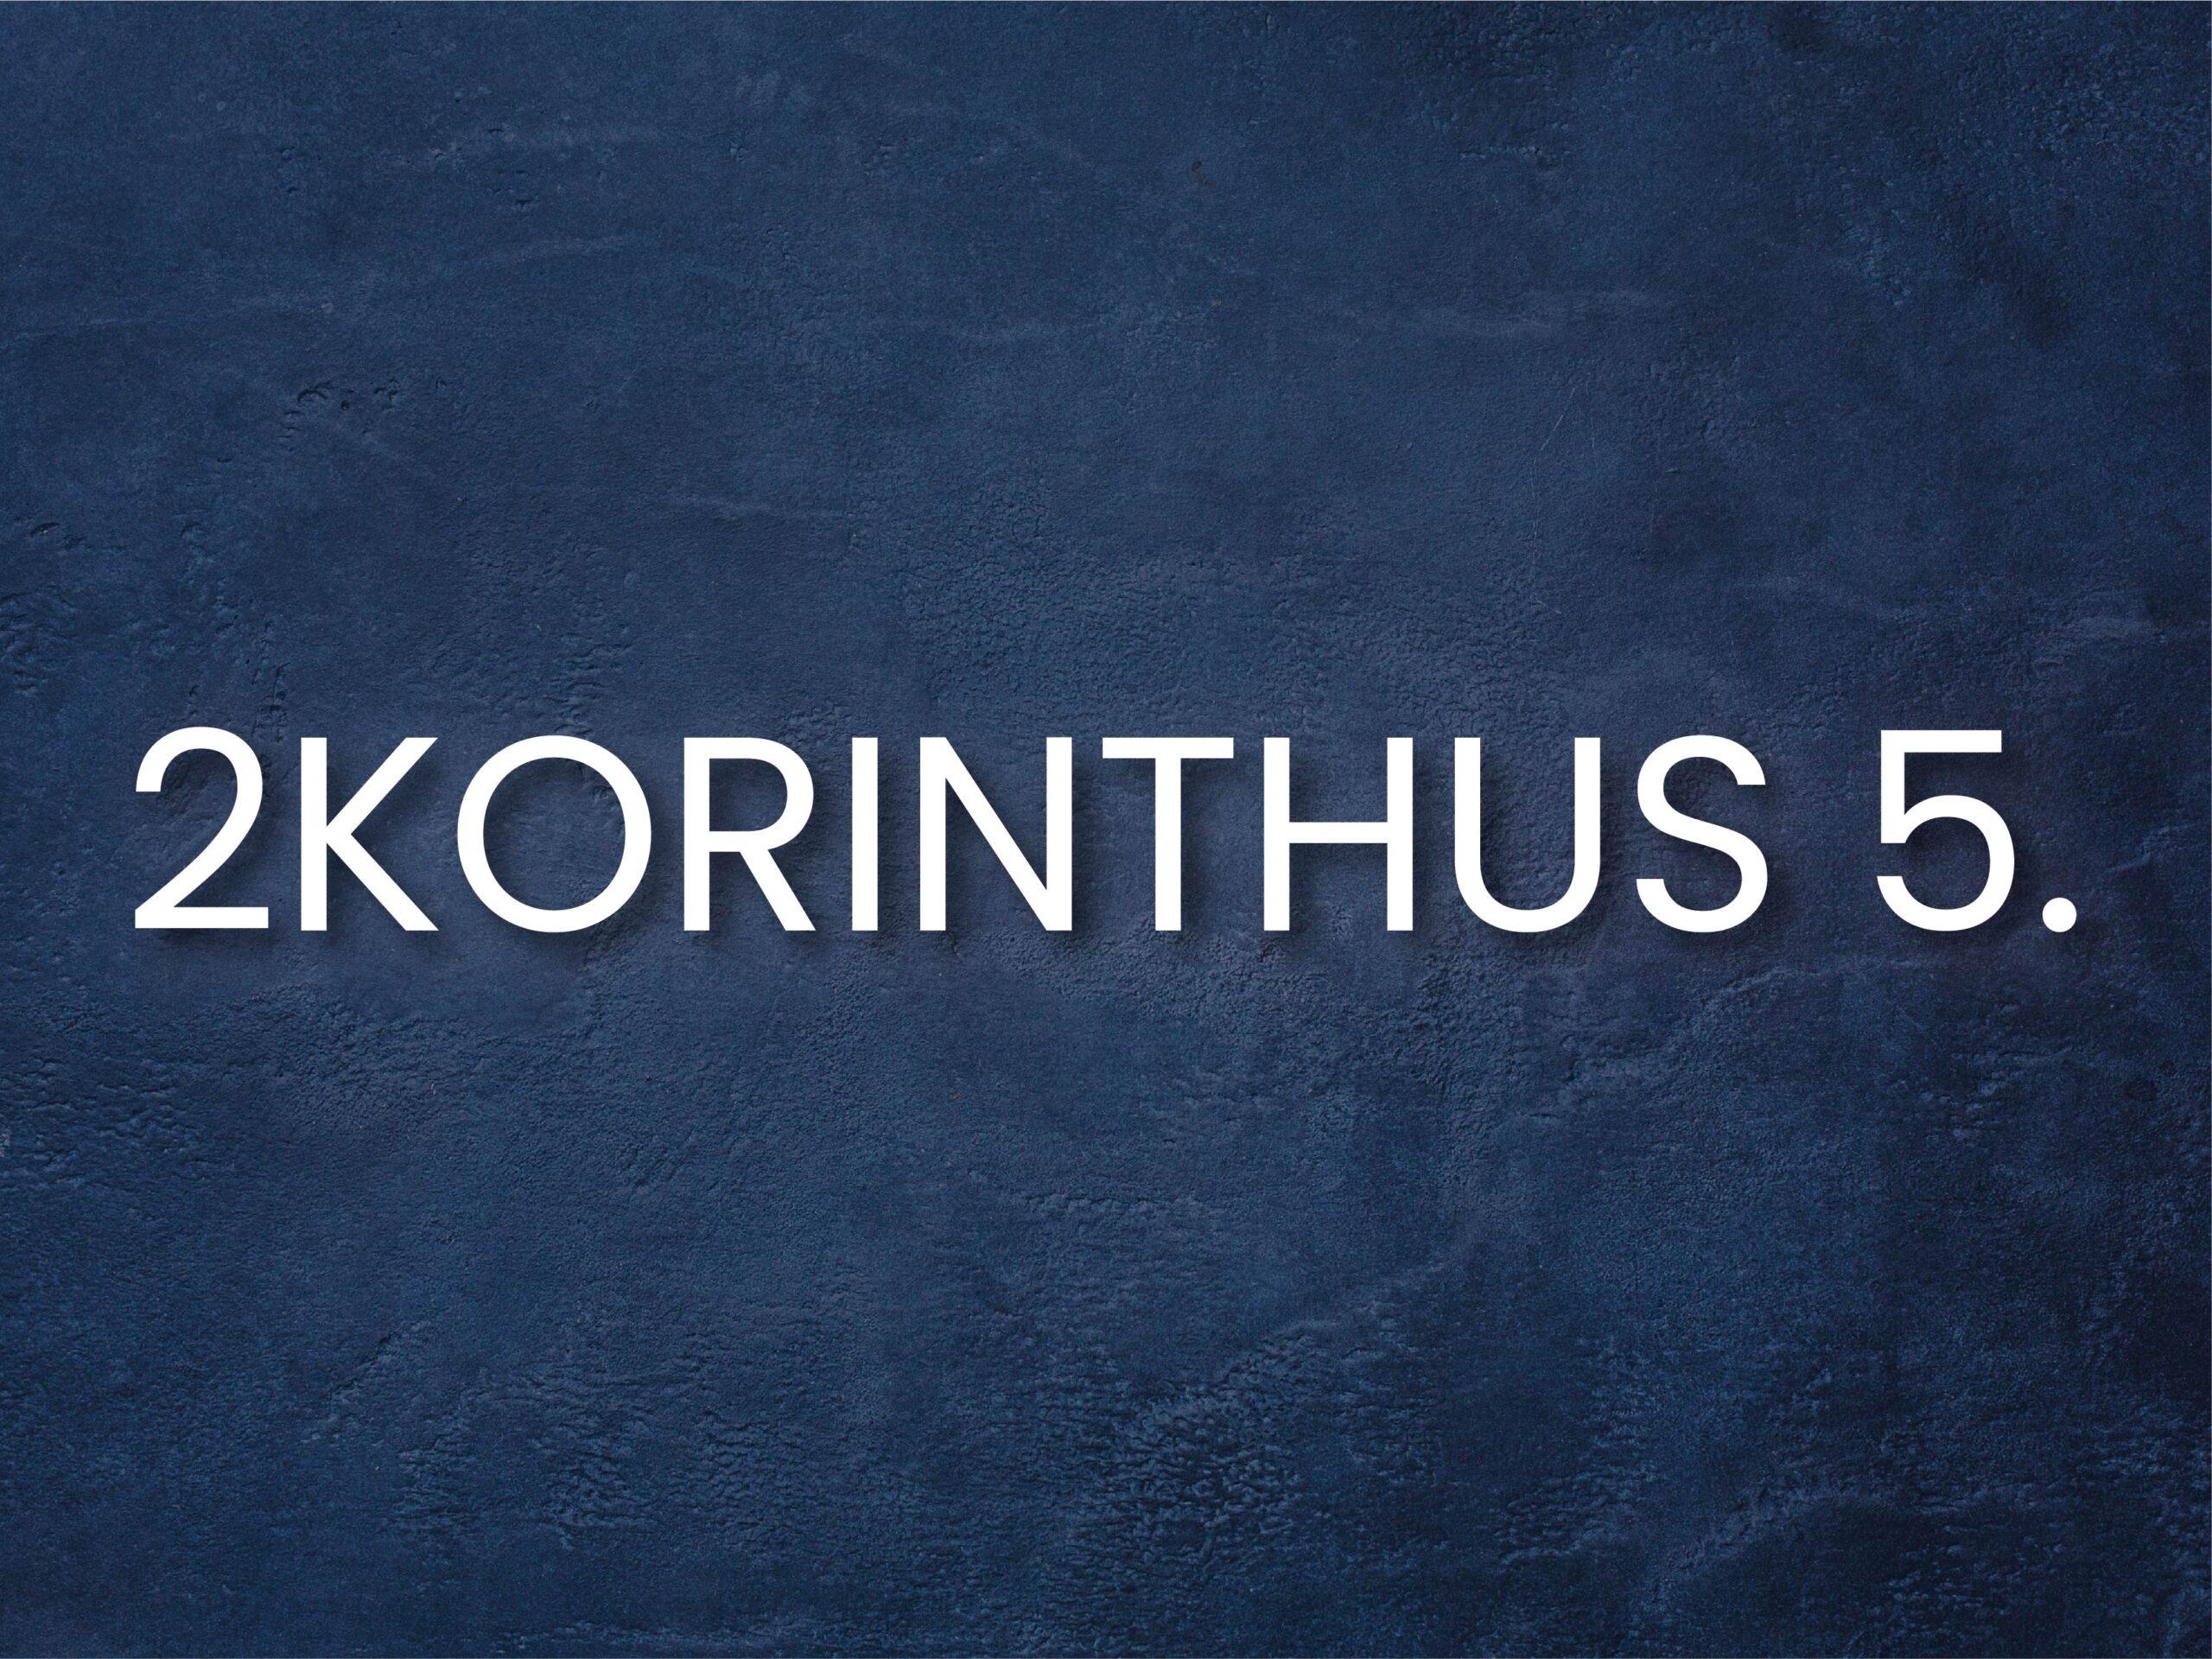 INFO_2korinthus_5